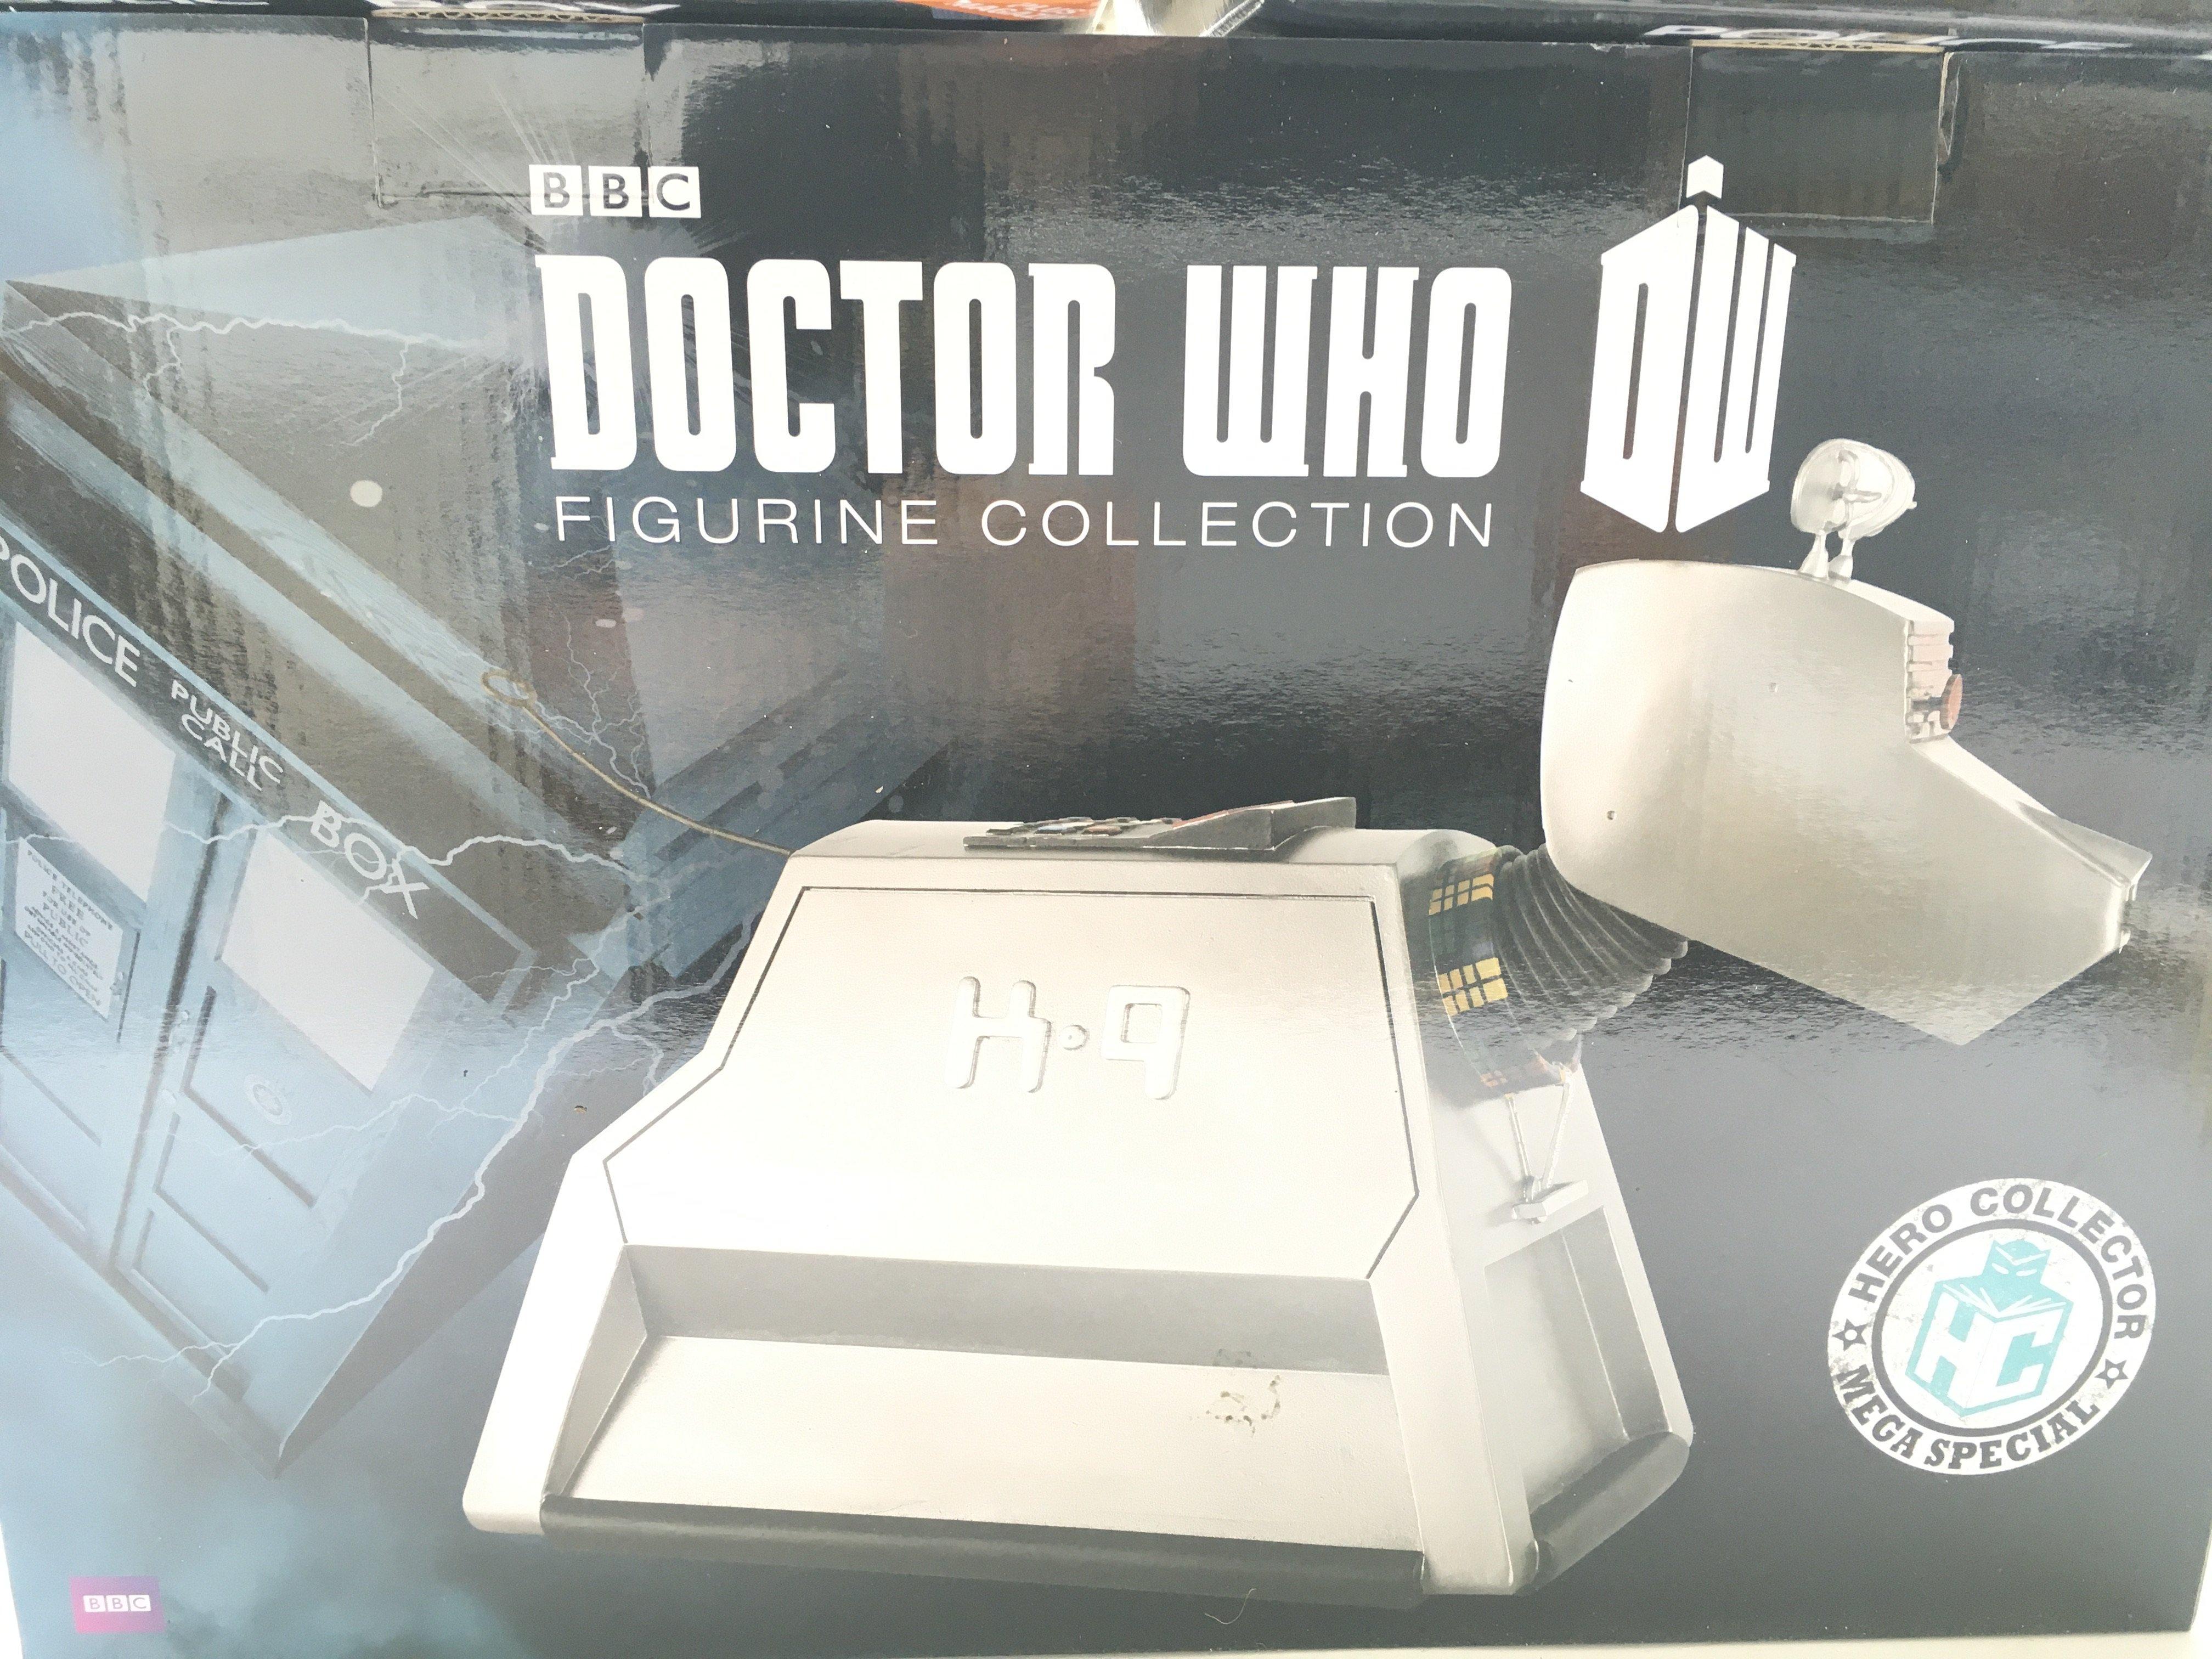 3 X Doctor Who EagleMoss Figurine Sets including a - Image 4 of 4